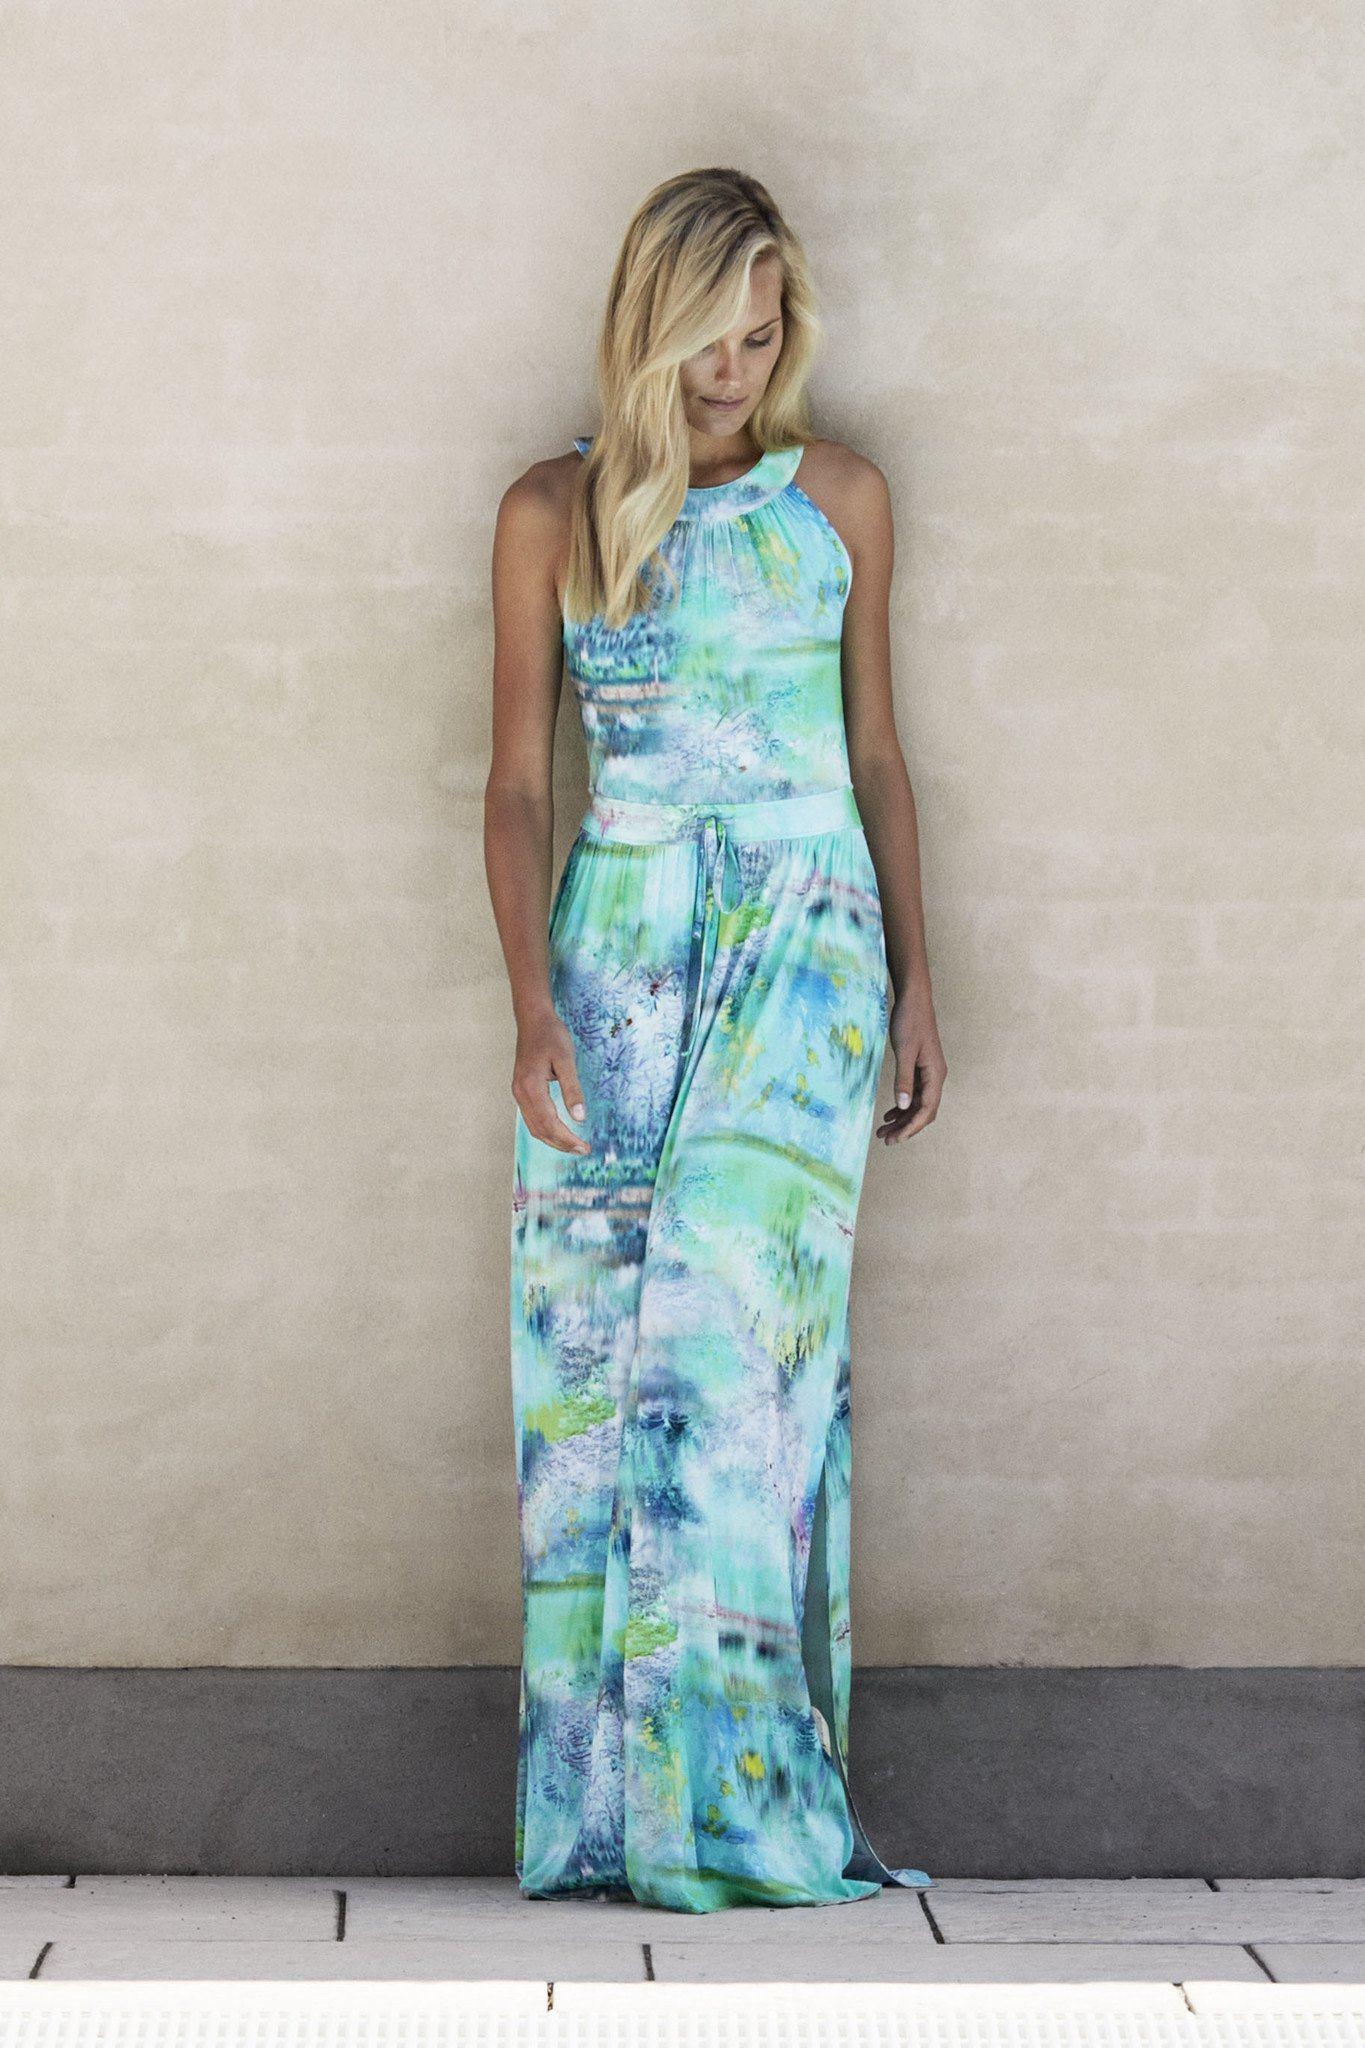 defffe3a2bd9 Ilse Jacobsen Soul33 Pastel Maxi Dress in Blue - Lyst